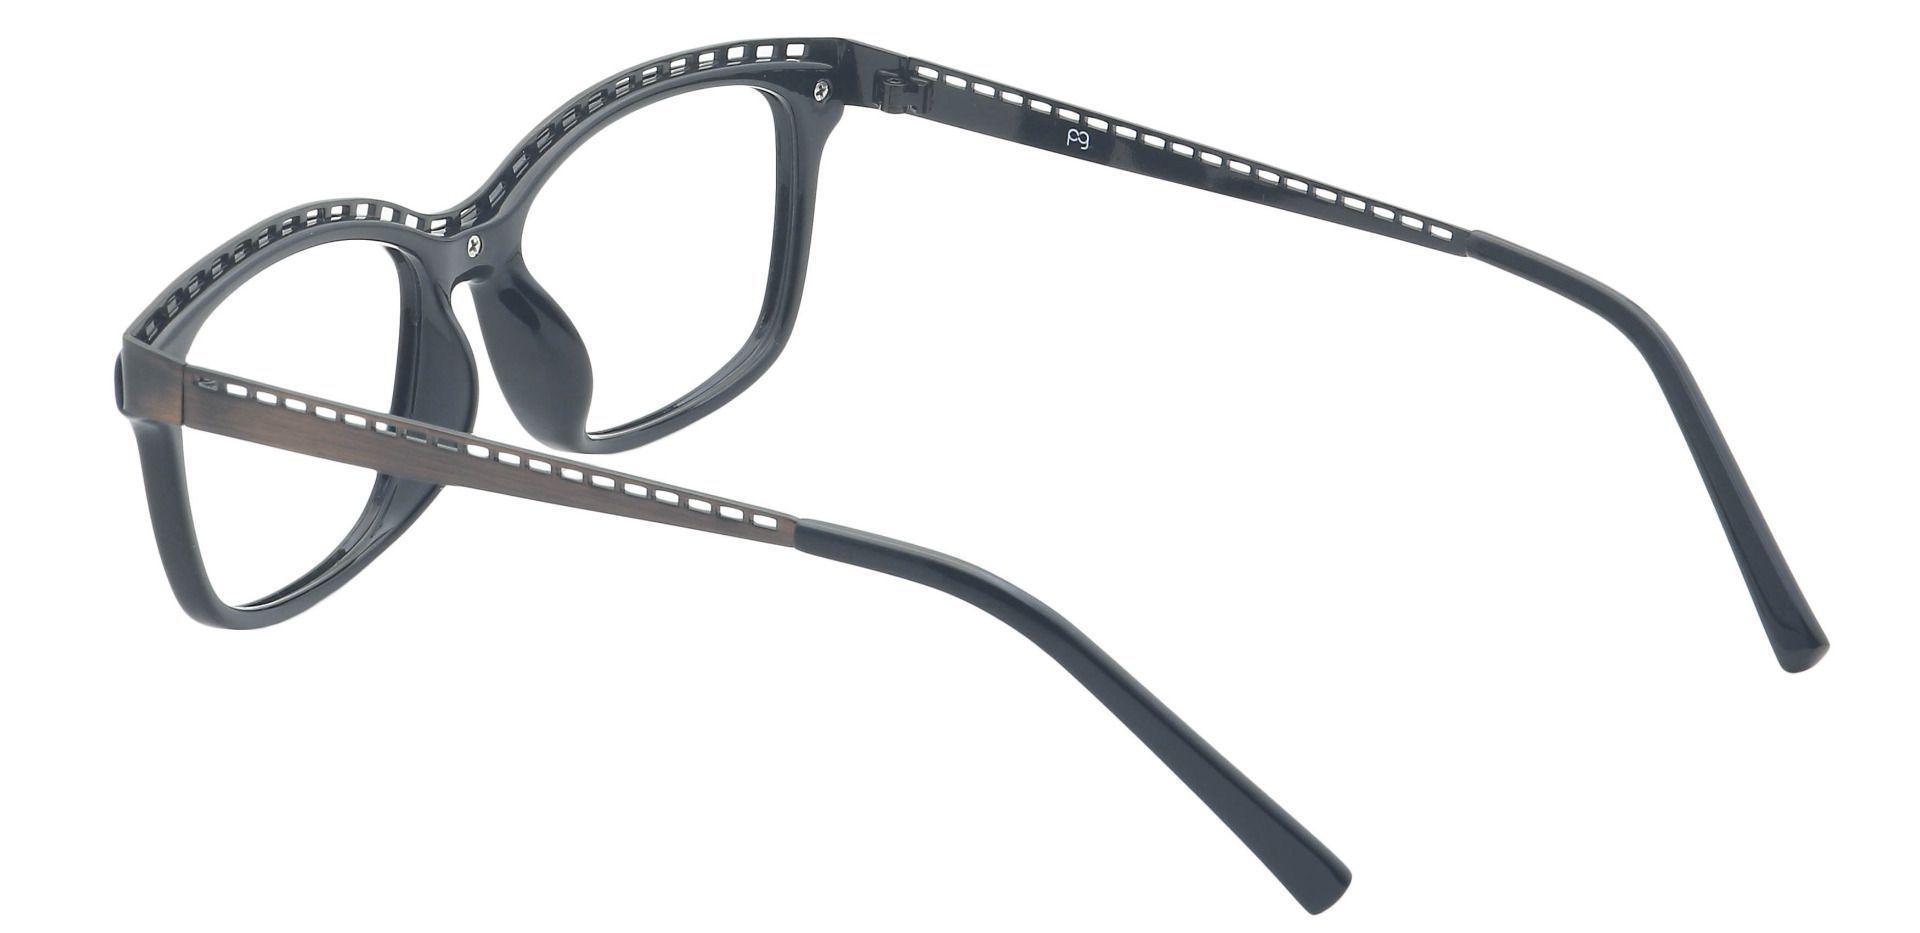 Richie Rectangle Eyeglasses Frame - Black